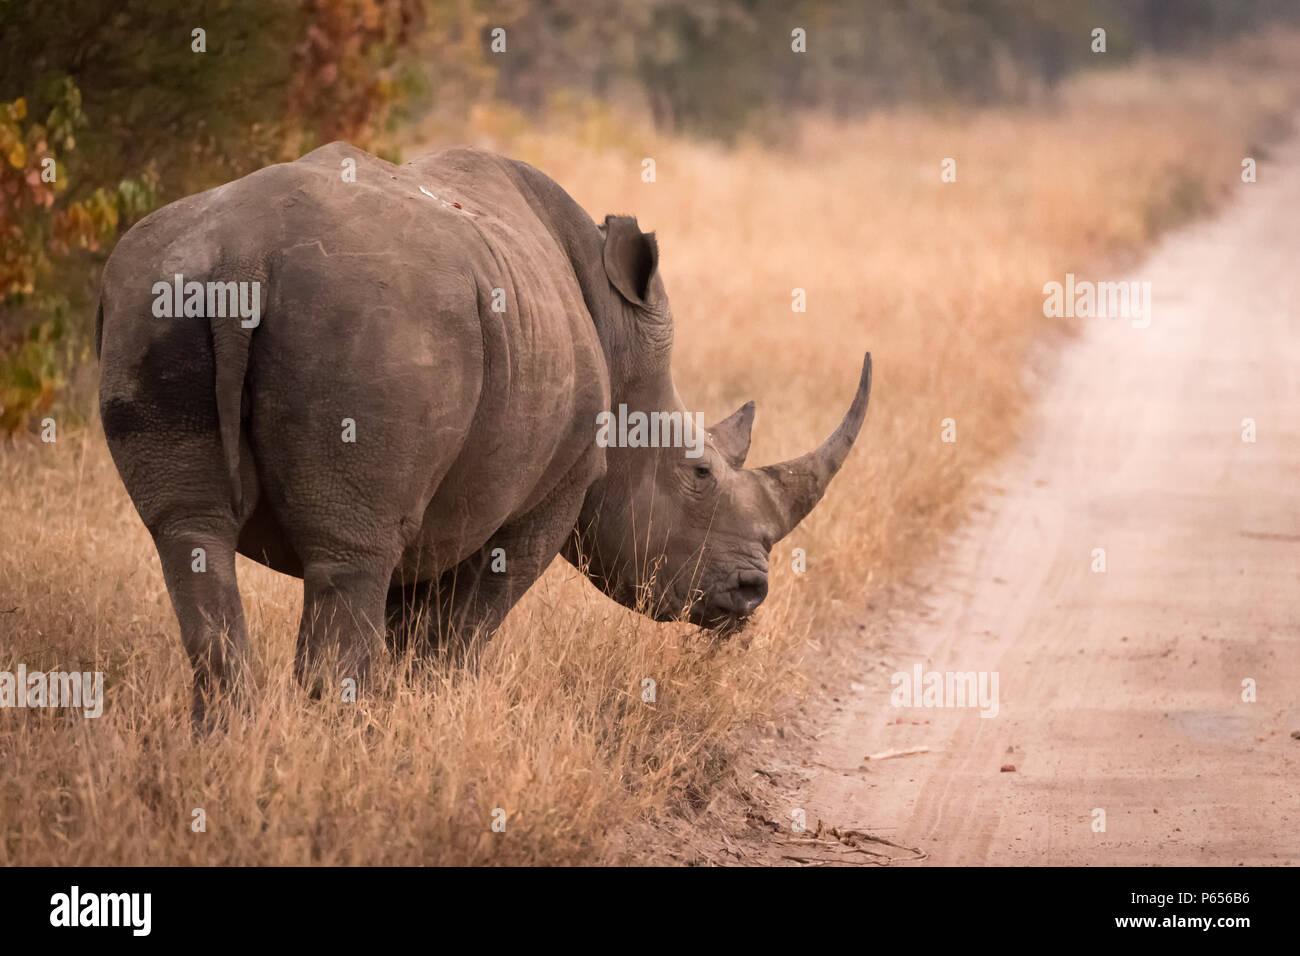 White Rhino am Straßenrand Stockbild